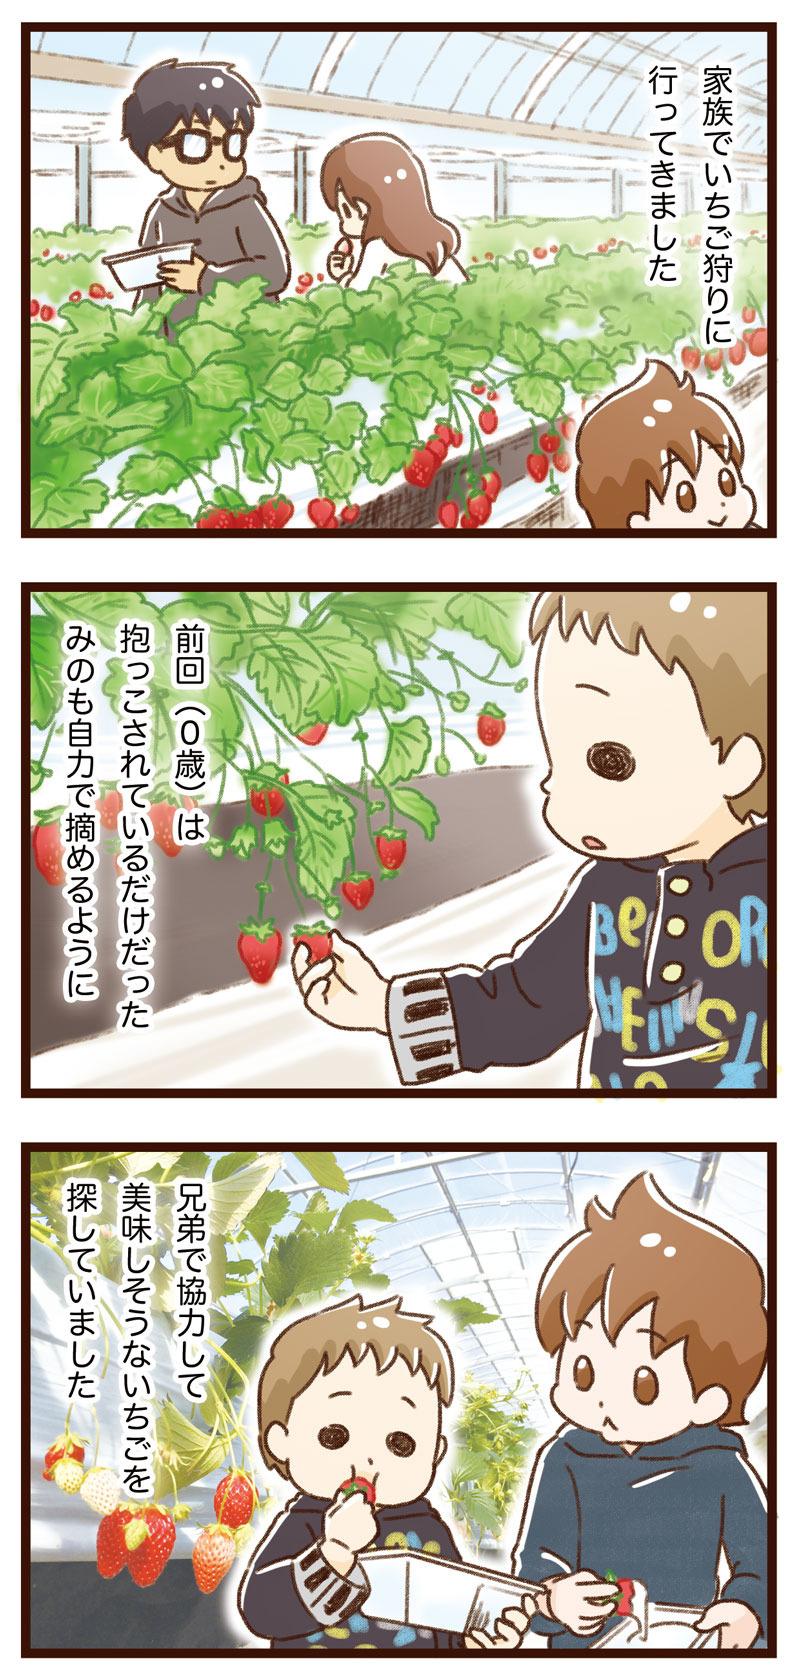 yumui261-1